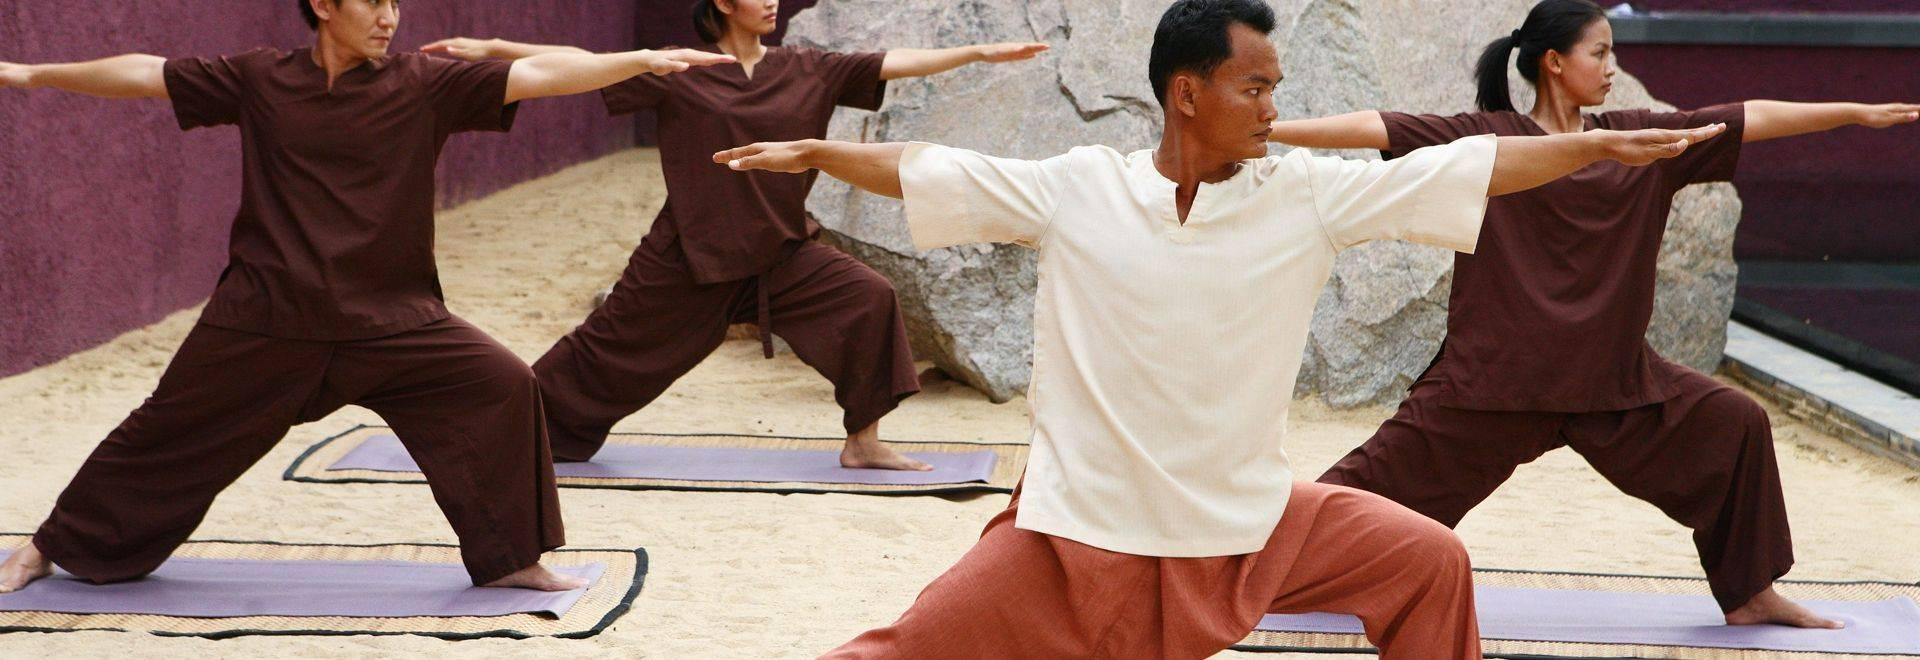 Barai-Spa-group-yoga.jpg